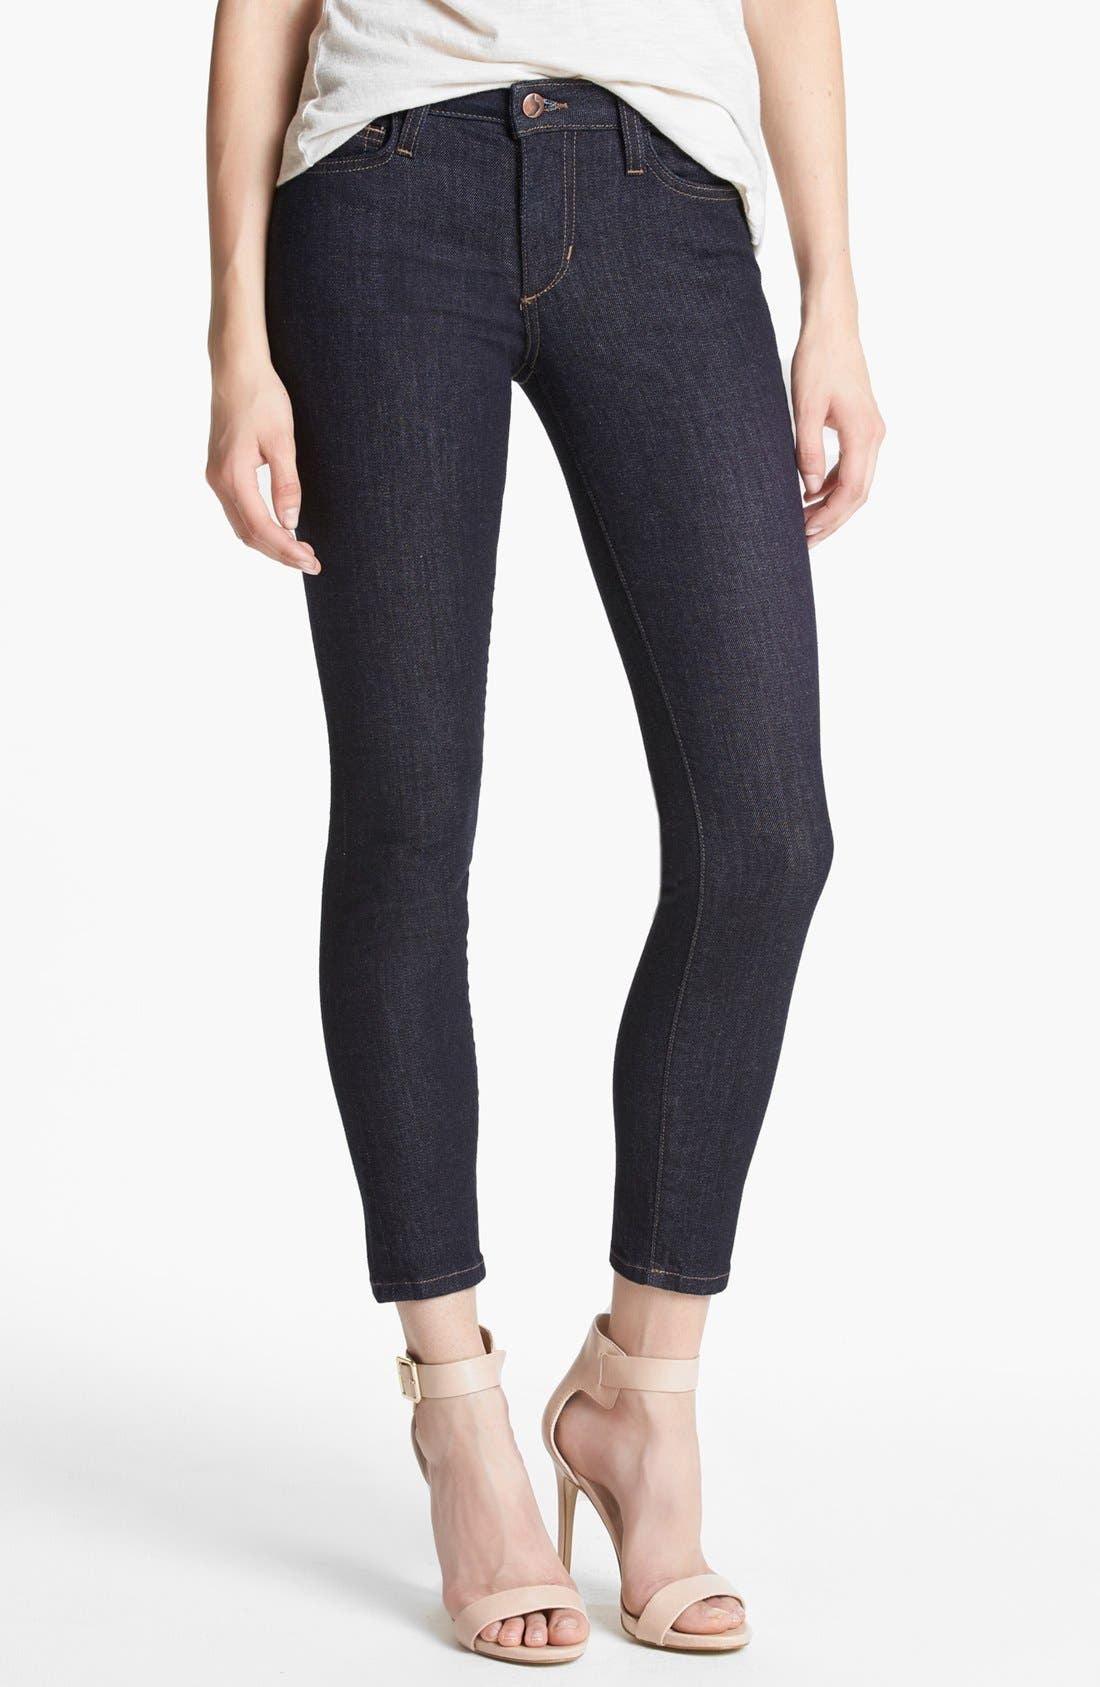 Alternate Image 1 Selected - Joe's Skinny Ankle Jeans (Alice)